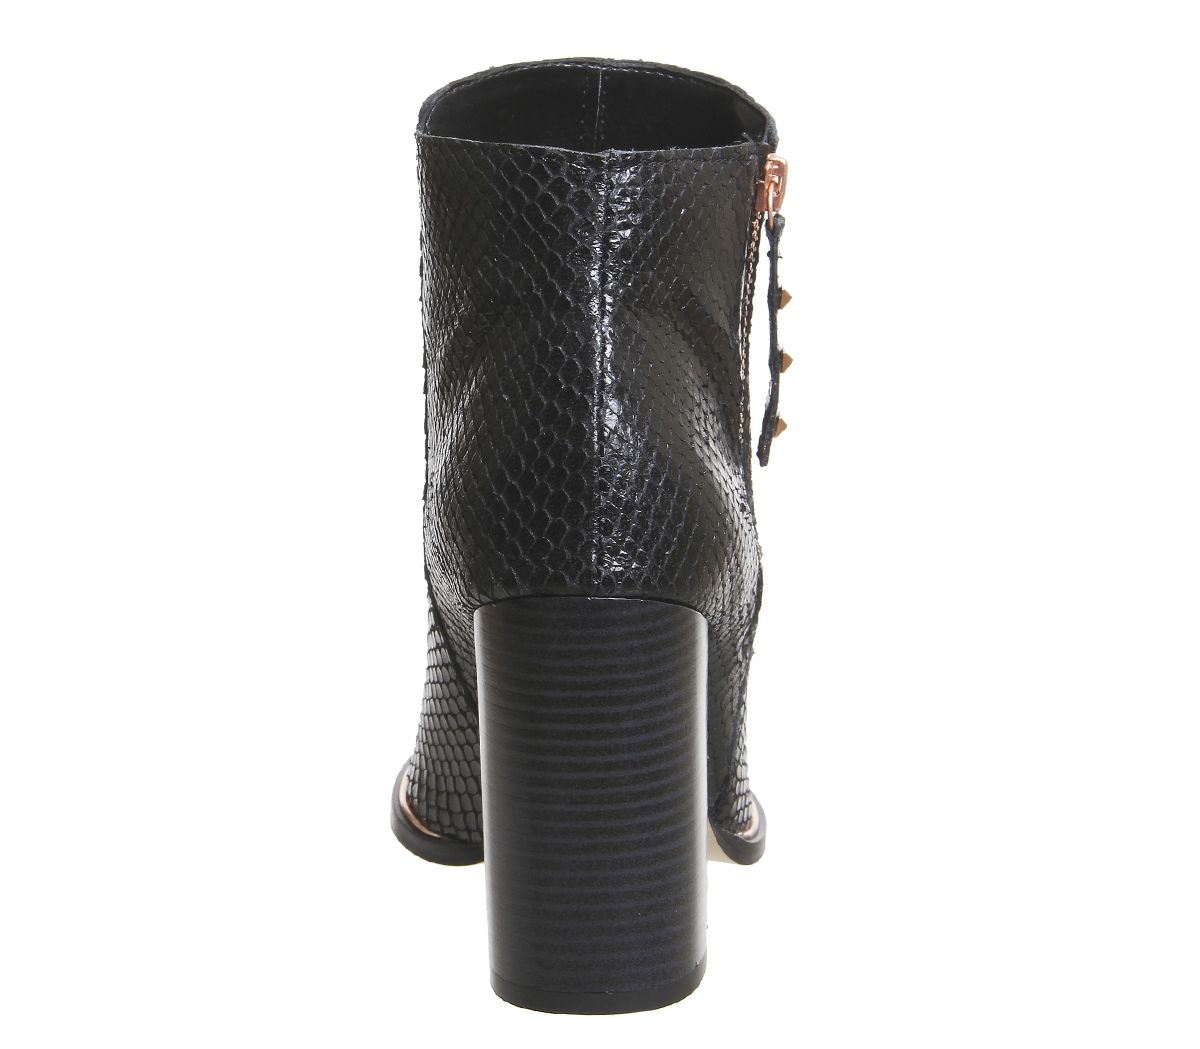 Womens Office Affluent Heel Side Zip Boots Black Snake Rose Gold Hardware Boots